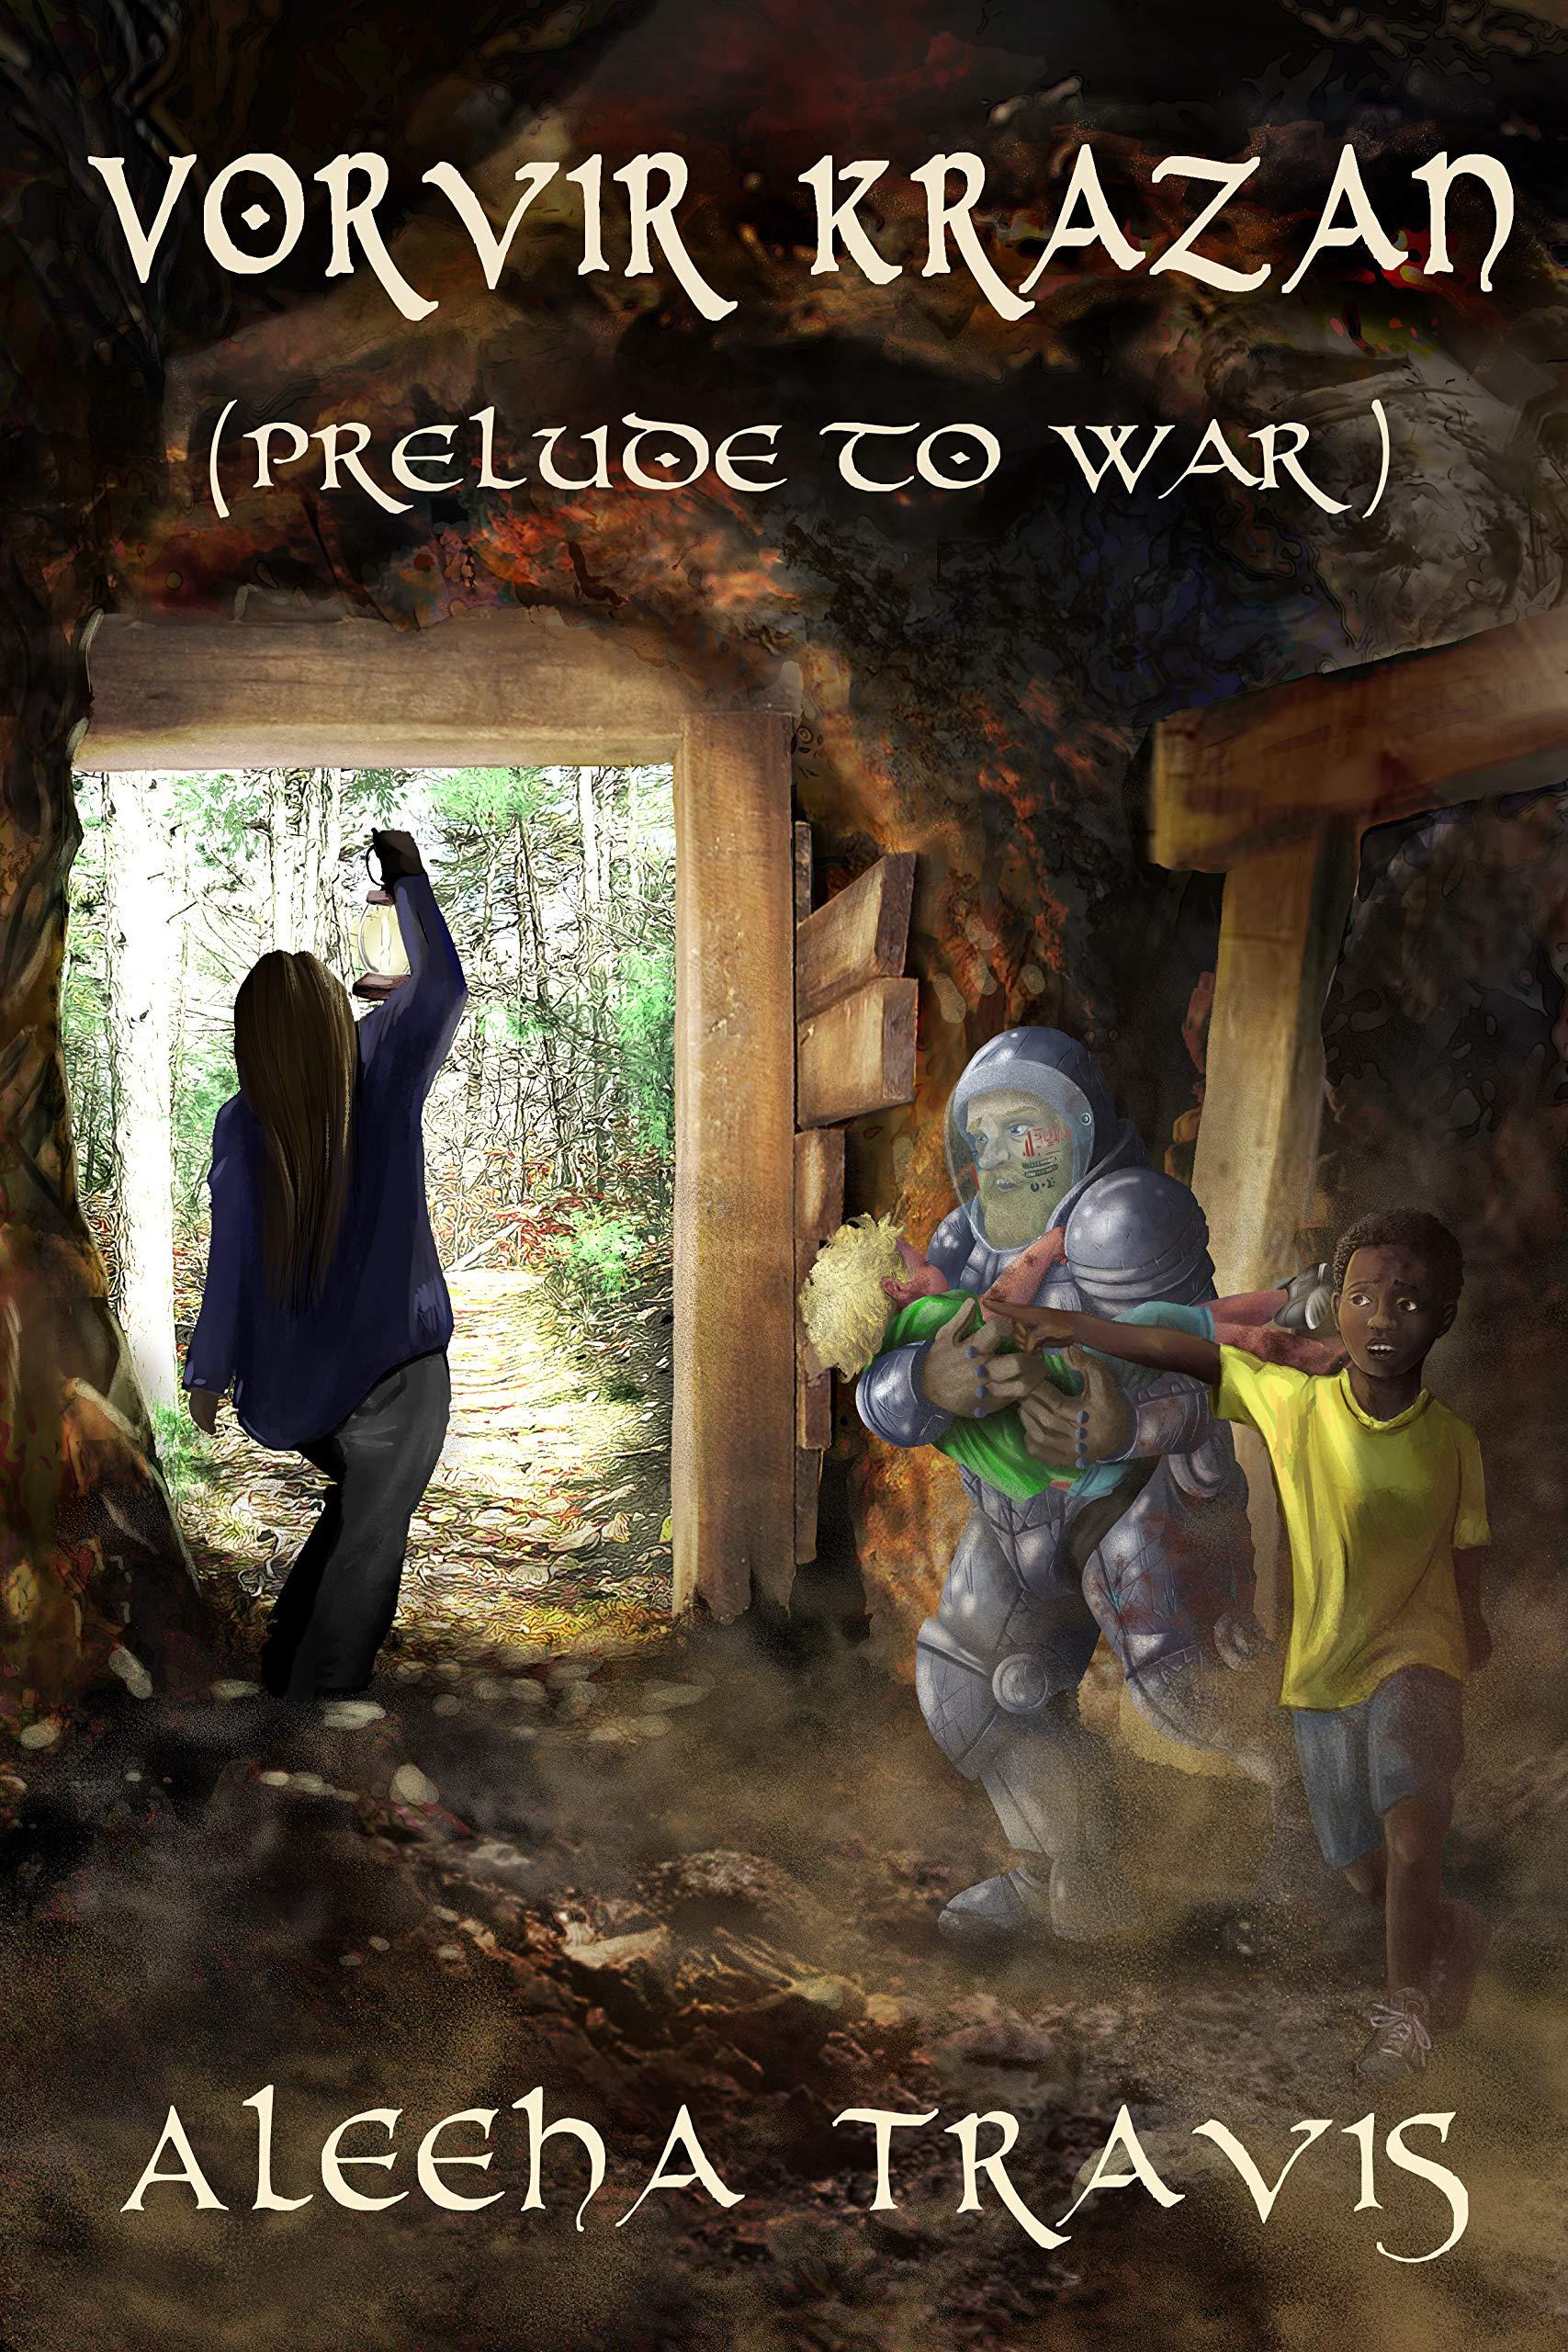 Vorvir Krazan: (Prelude to War) (Third Cycle of Gorain Book 1)